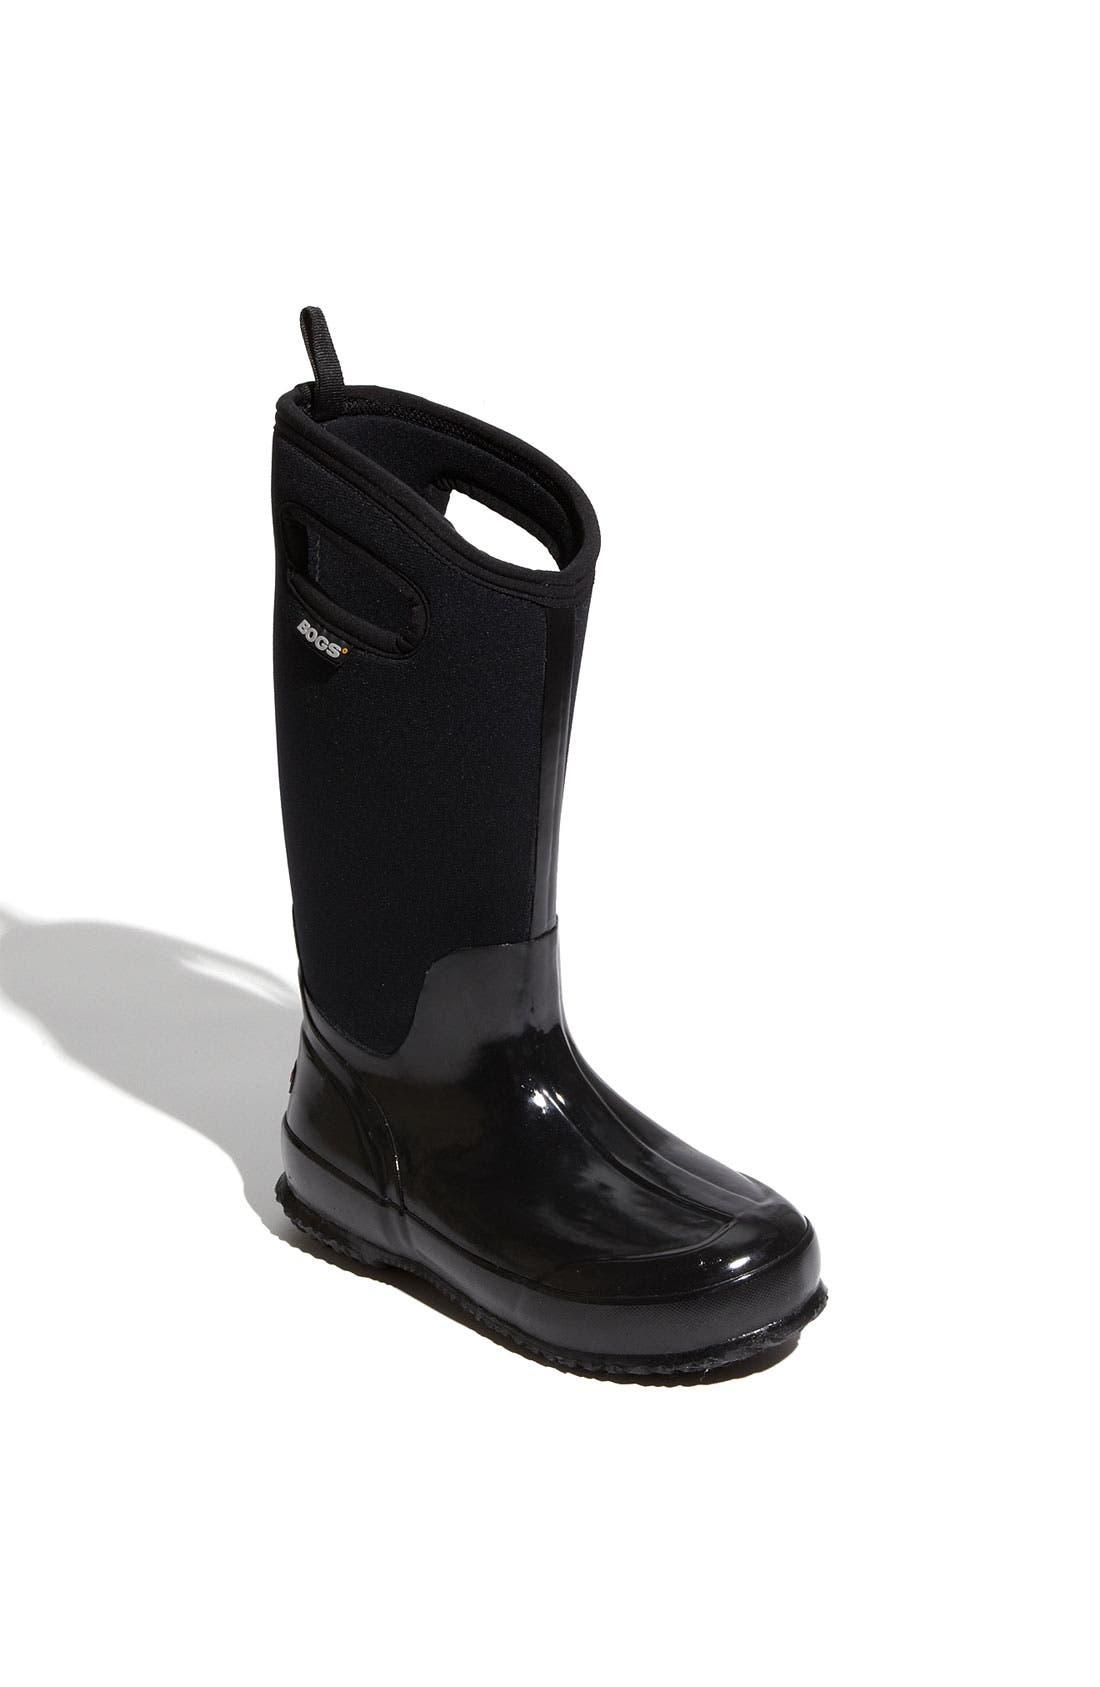 Bogs 'Classic' Tall Rain Boot (Women) | Nordstrom